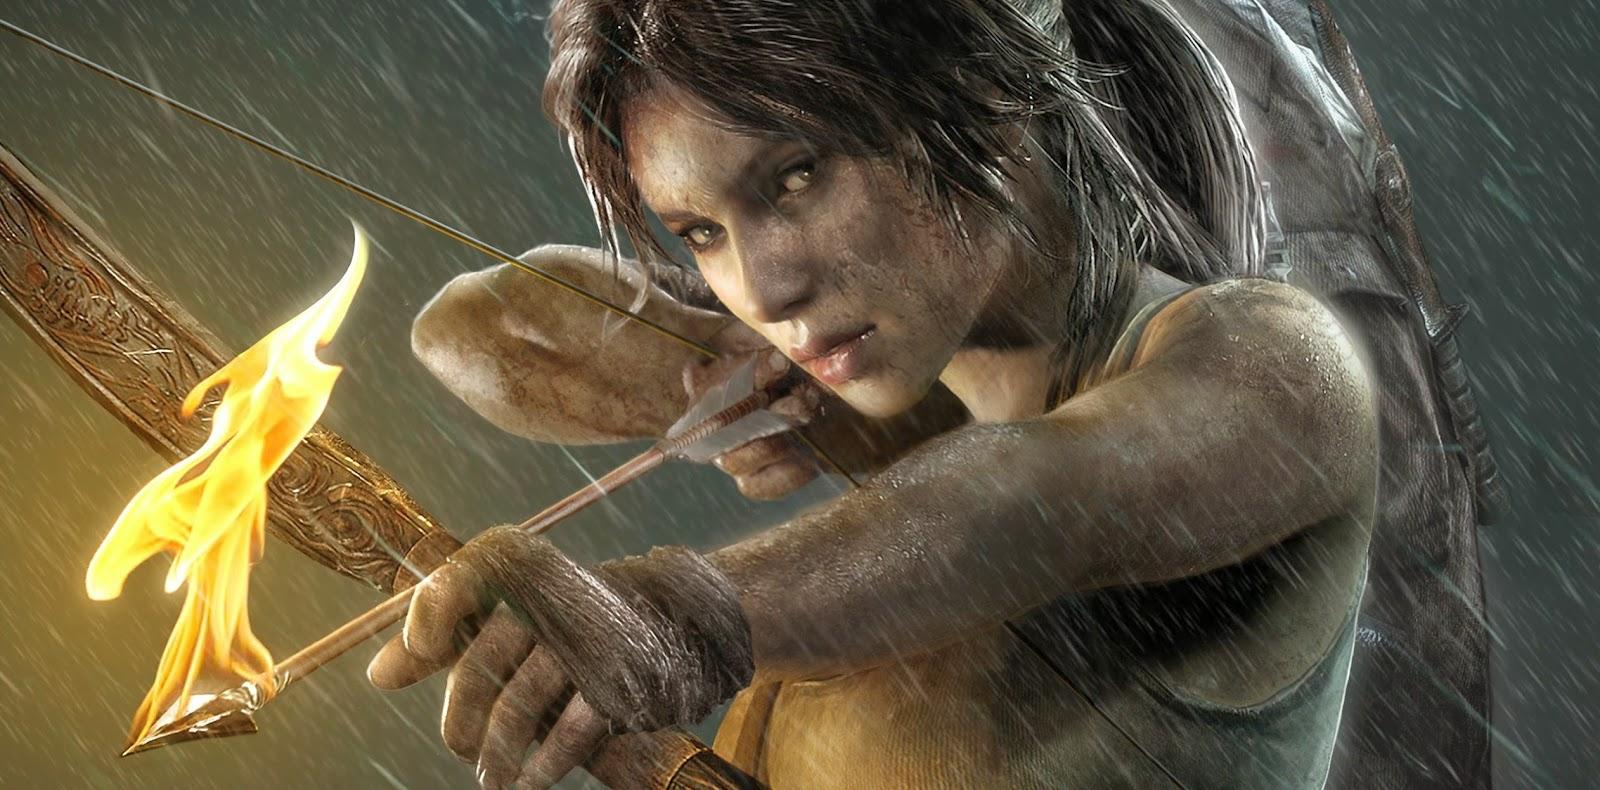 Warner Bros & MGM contrata roteirista de As Tartarugas Ninja para escrever reinicio de Tomb Raider